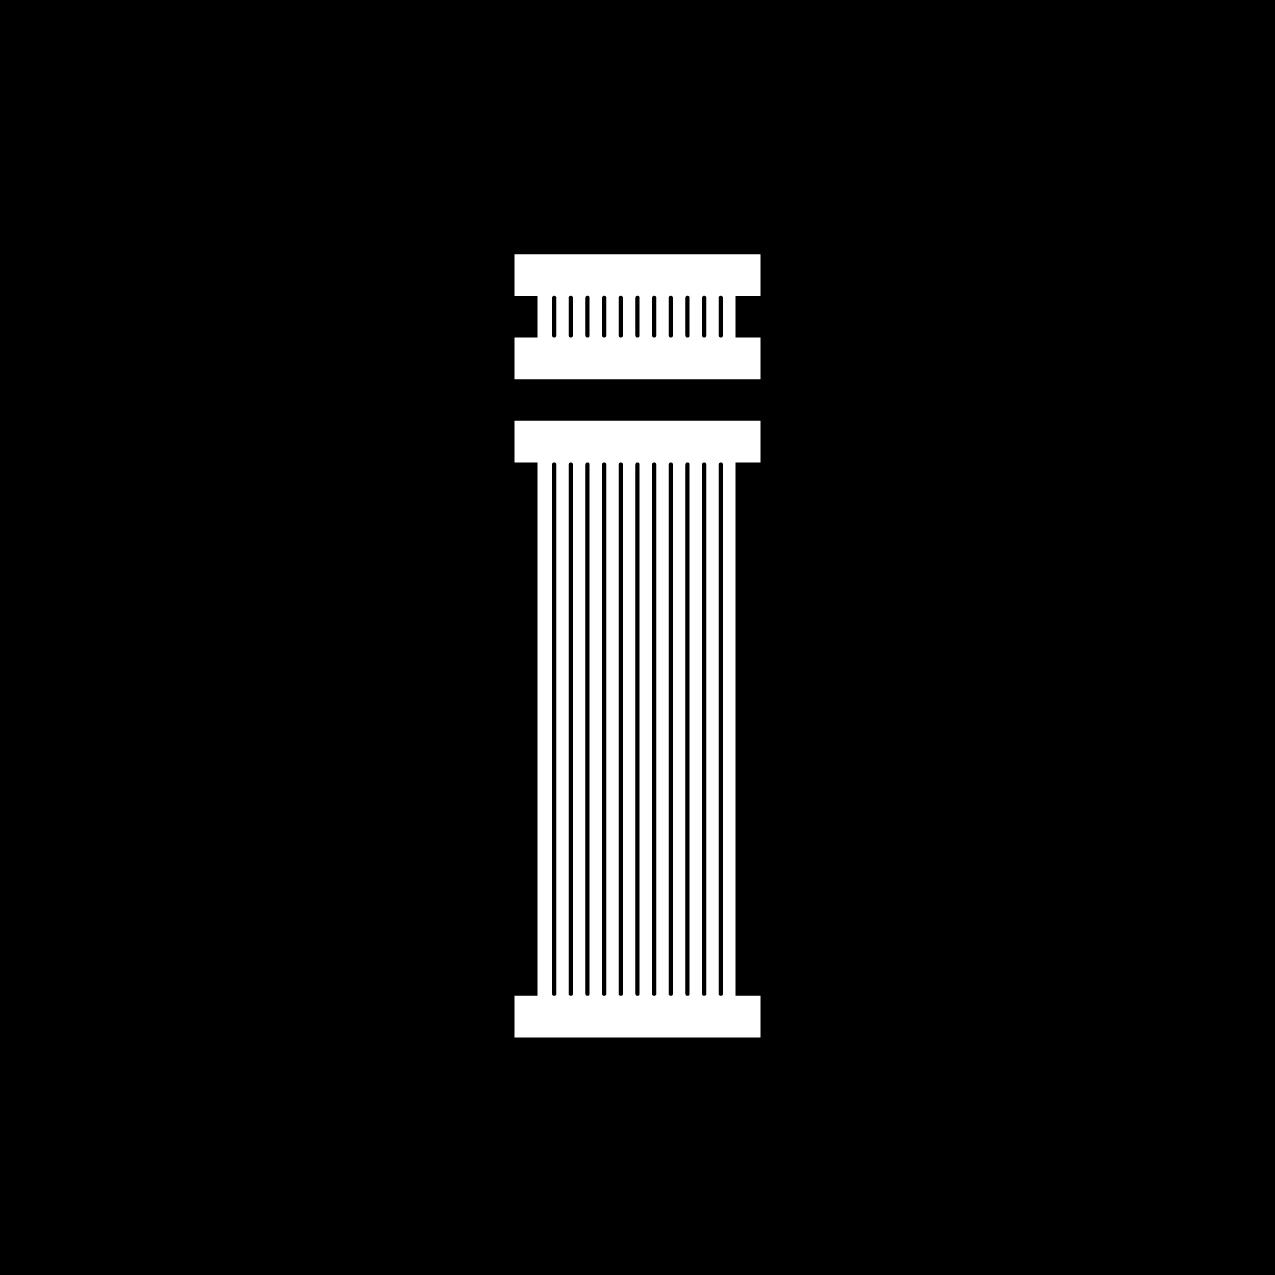 Letter I1 Design by Furia